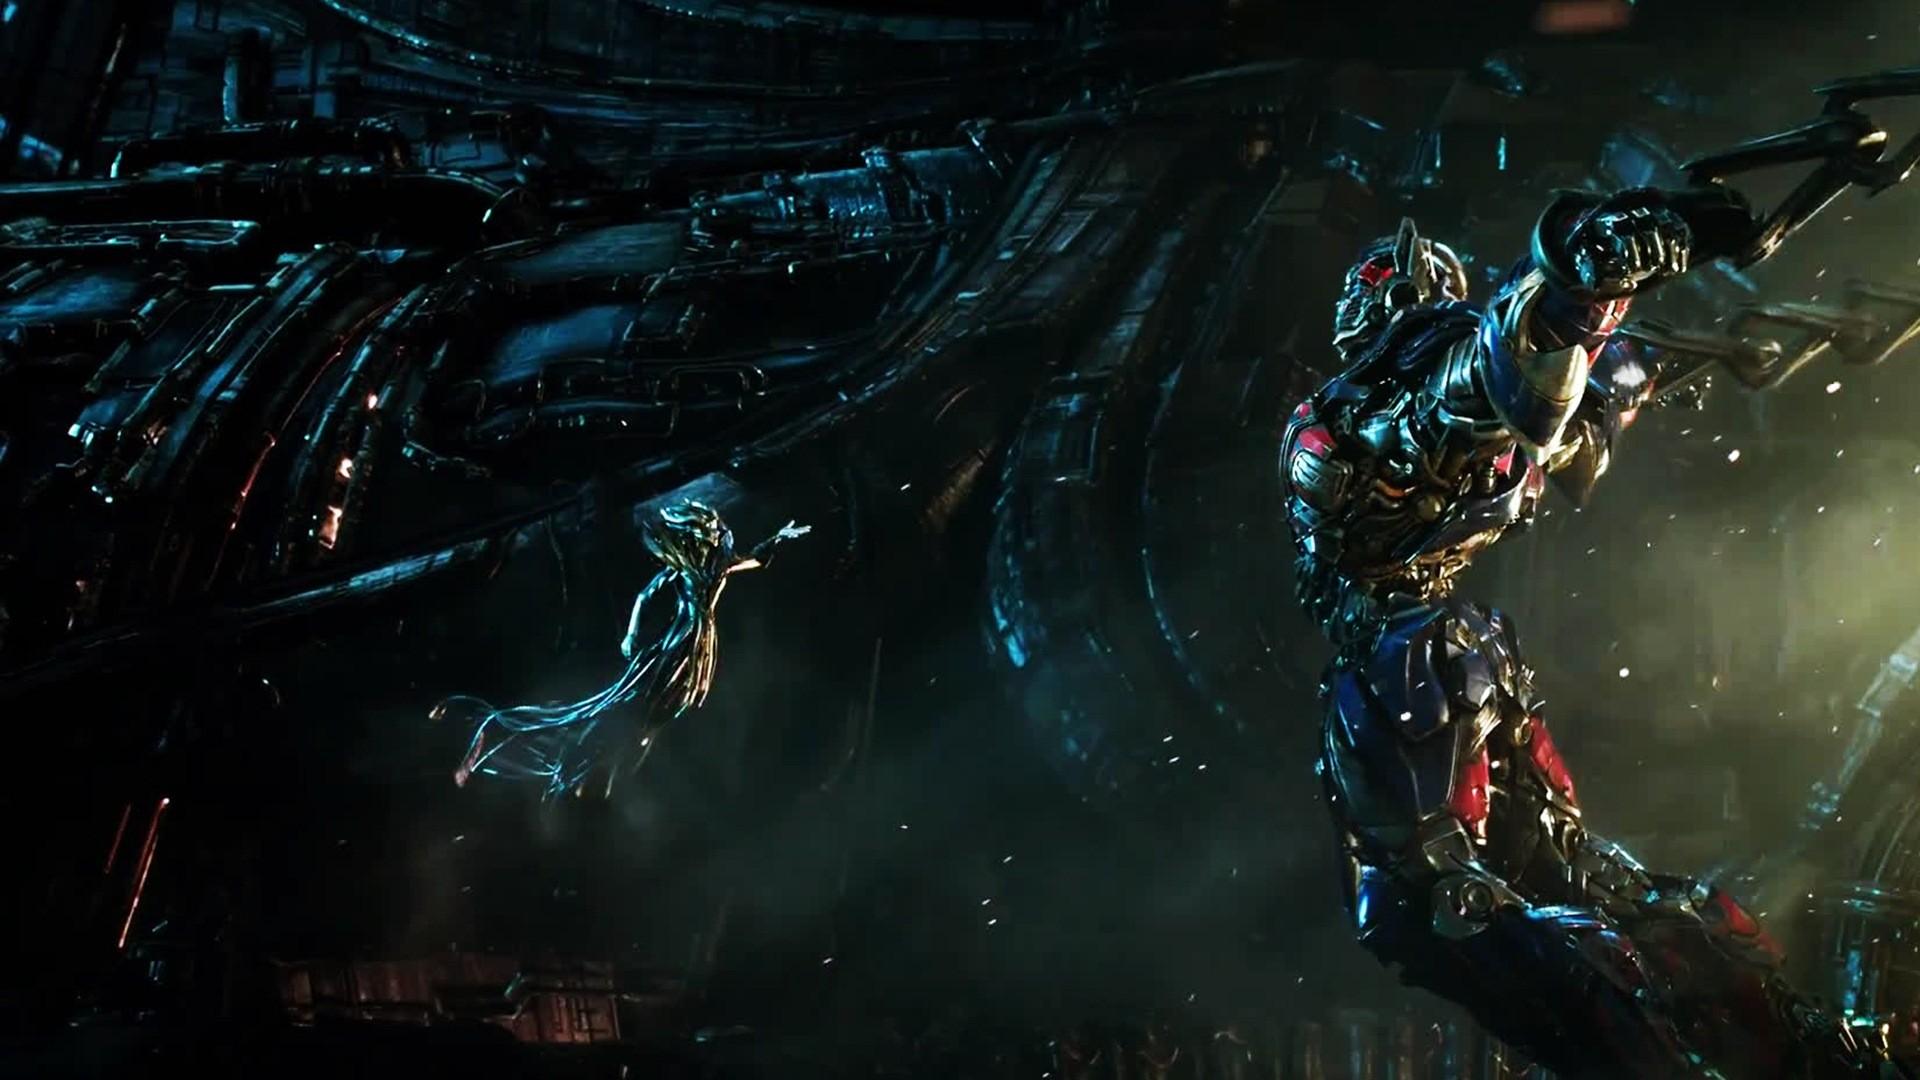 transformers 3d wallpaper